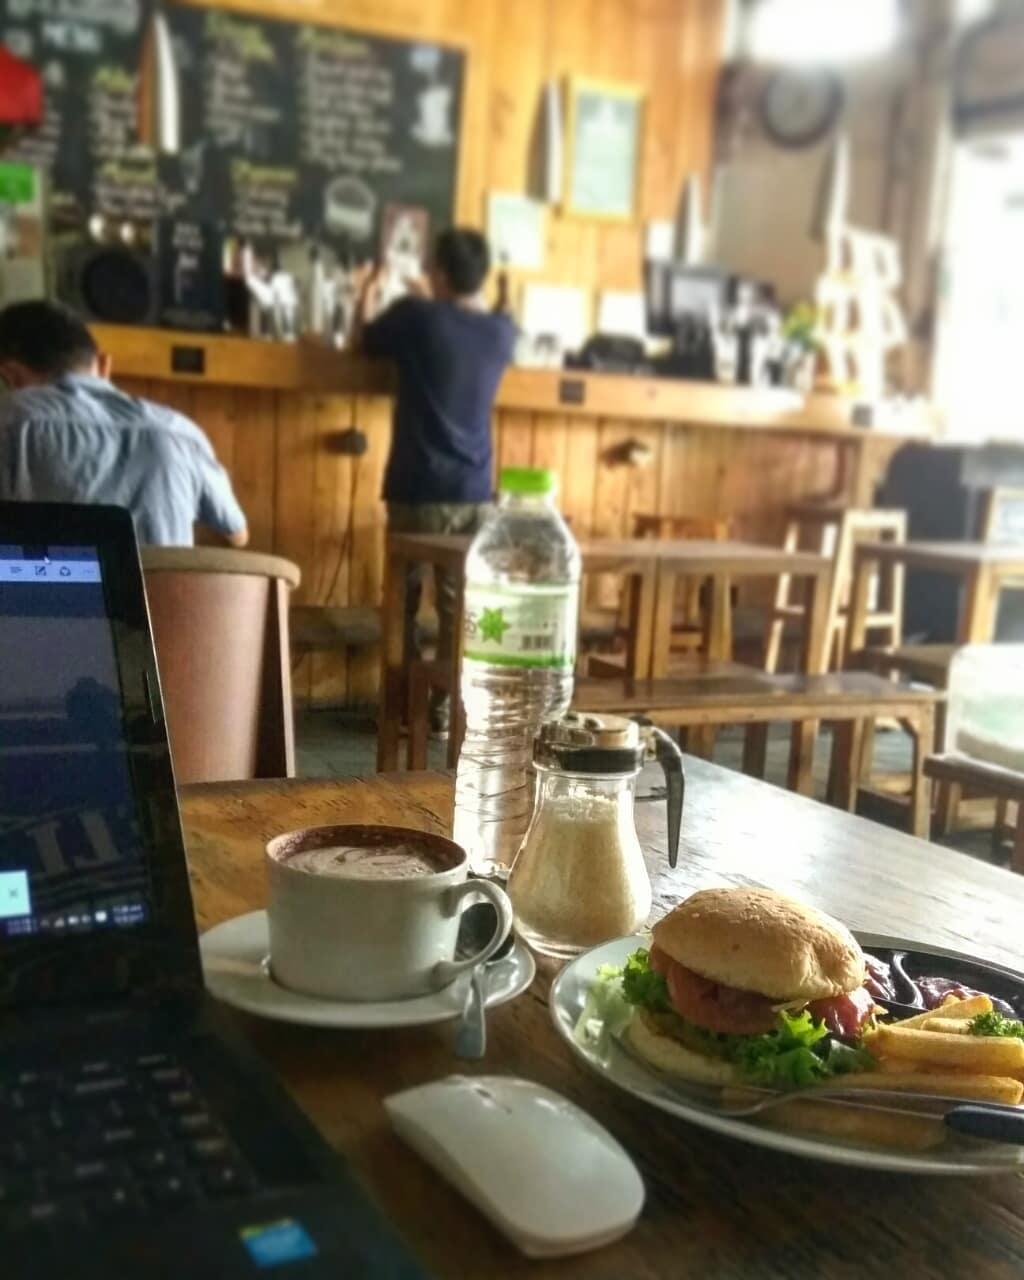 Kedai Kopi Mataram, Kedai Kopi Mataram Yogyakarta, Kota Yogyakarta, Dolan Dolen, Dolaners Kedai Kopi Mataram via tiadez - Dolan Dolen